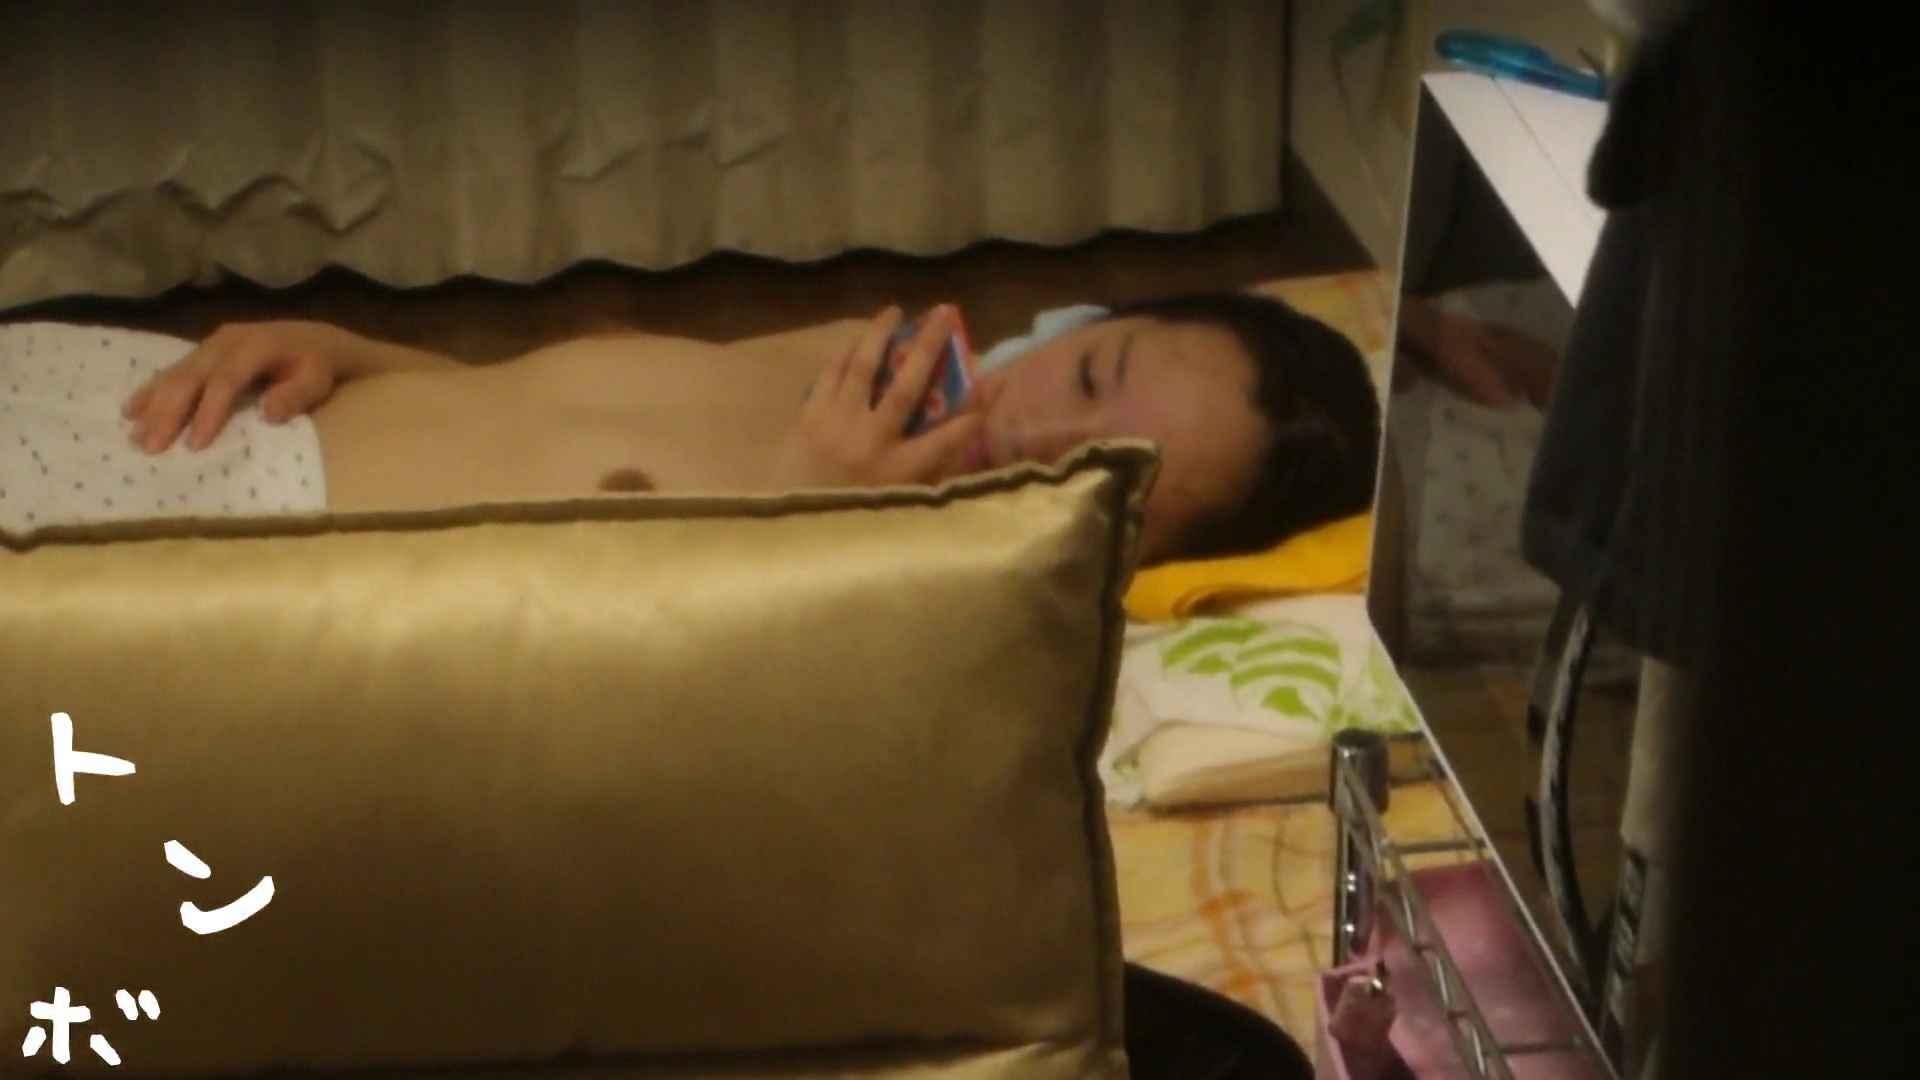 【15位 2016】リアル盗撮 S級美女女子大生の私生活1 美女 | 高画質  83画像 11